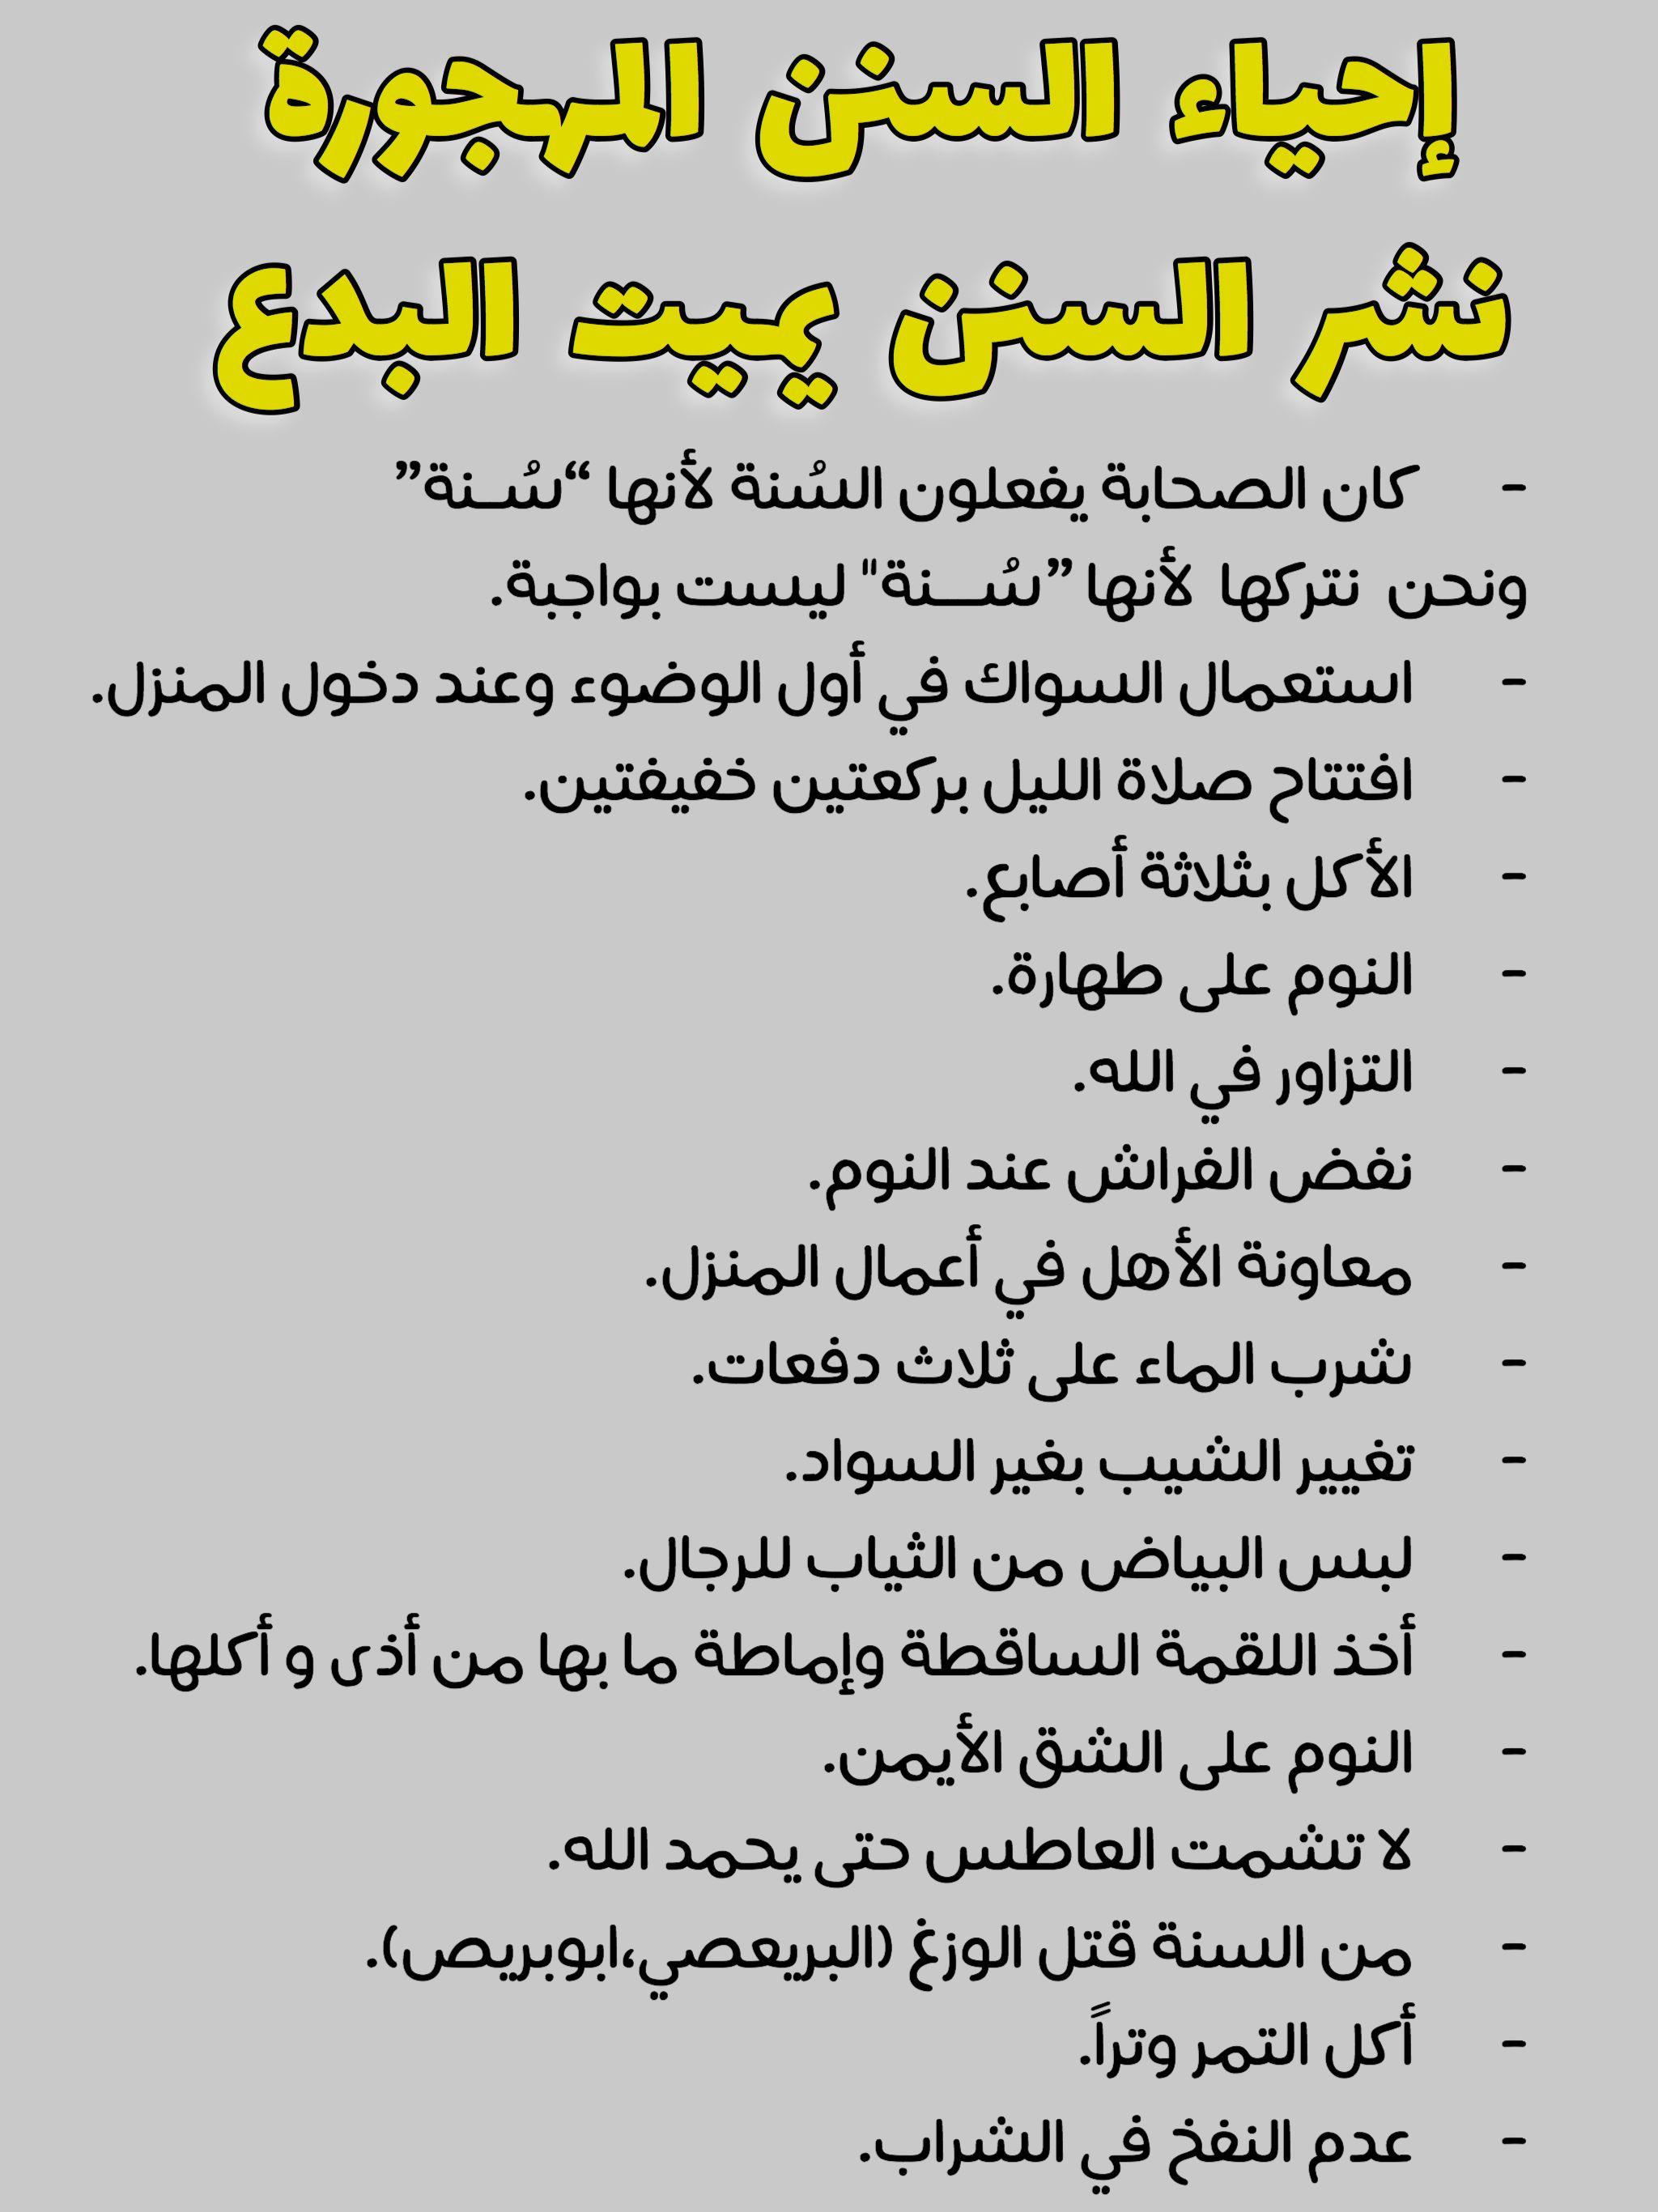 سنن مهجورة Islamic Quotes Islamic Quotes Quran Great Inspirational Quotes